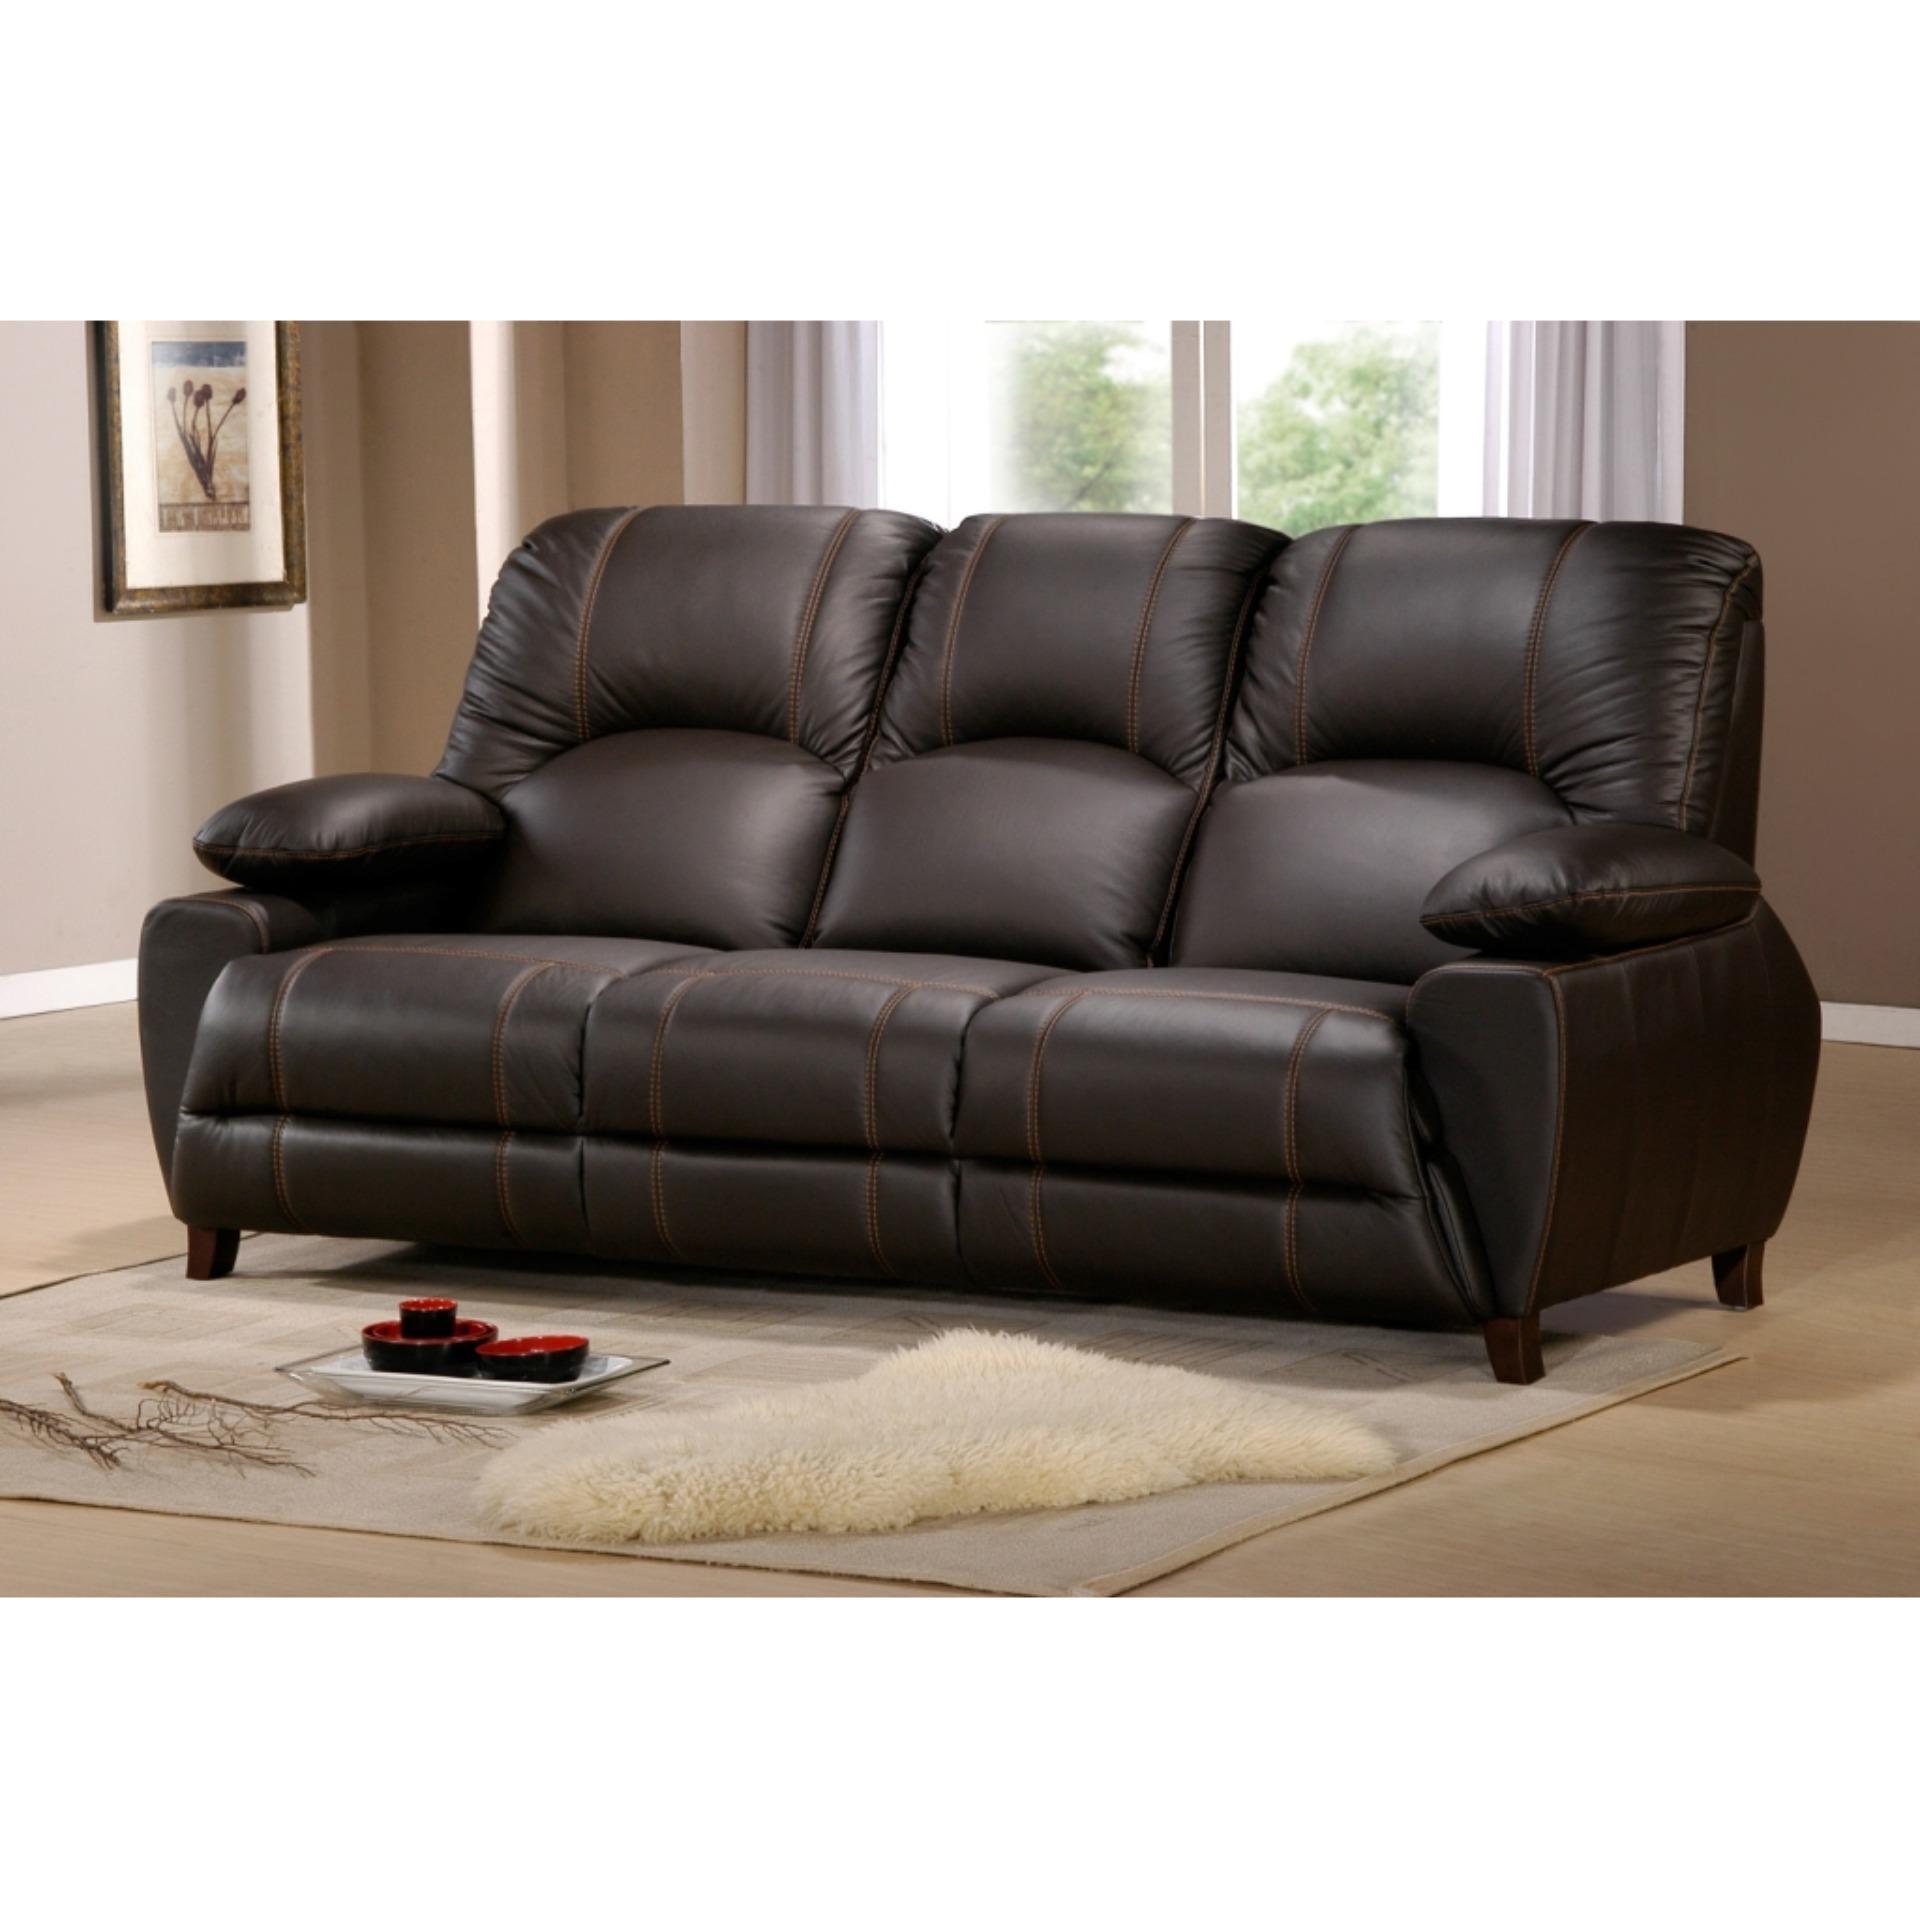 Univonna Danny 3-seater sofa cum folding cup holder